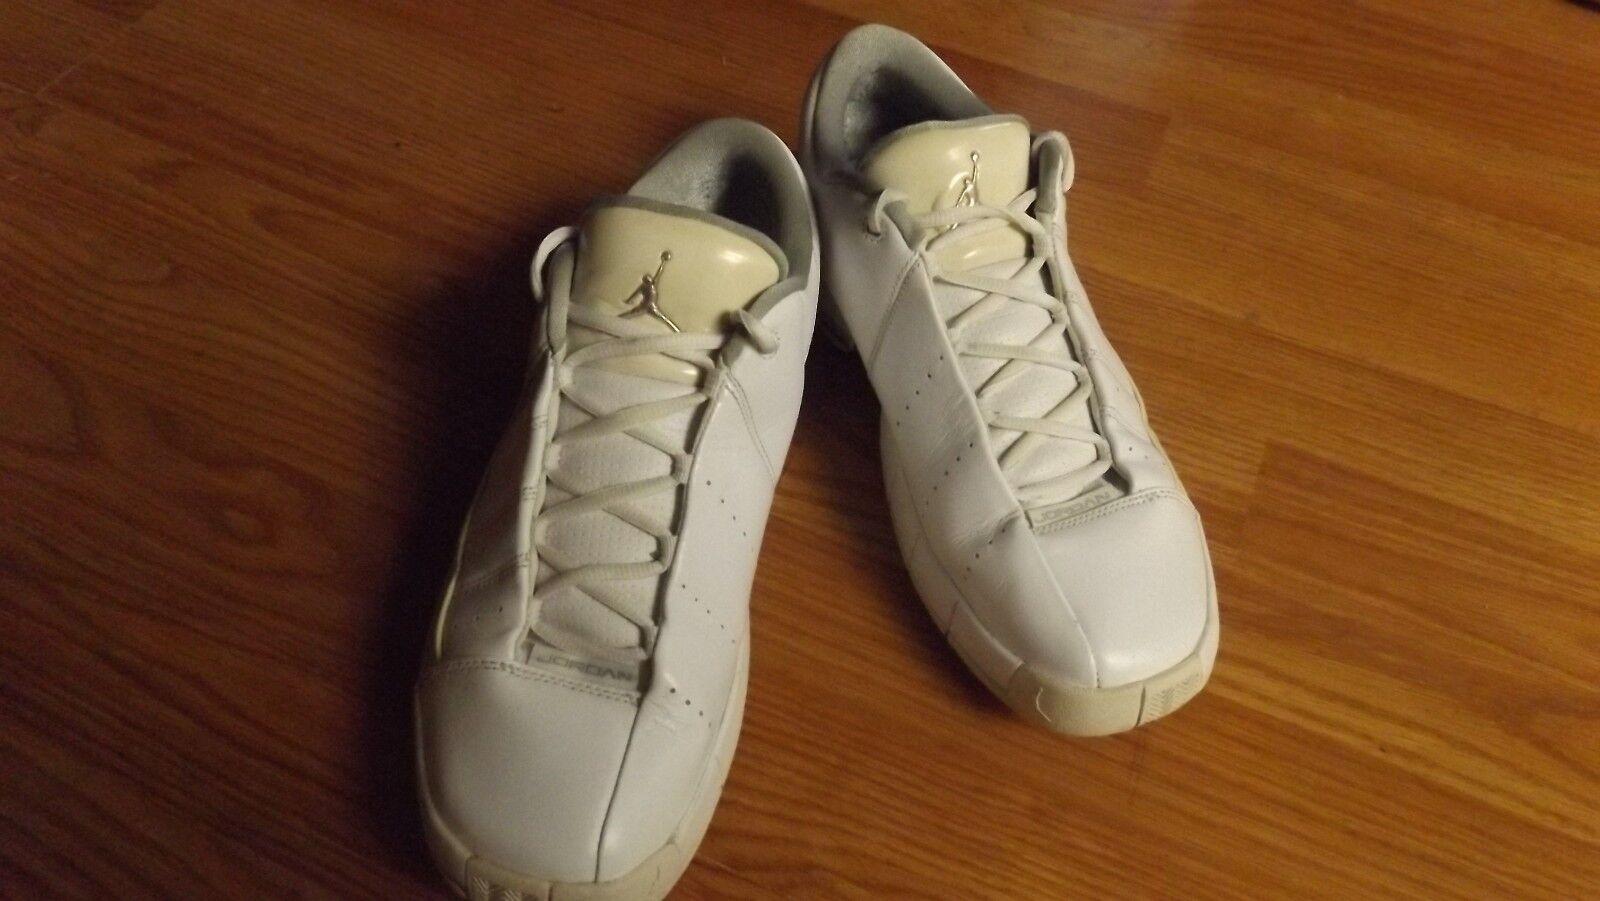 NIKE Air Jordan TE II Advance Shoes White and Gold 395468-101 Men 10.5 Wild casual shoes